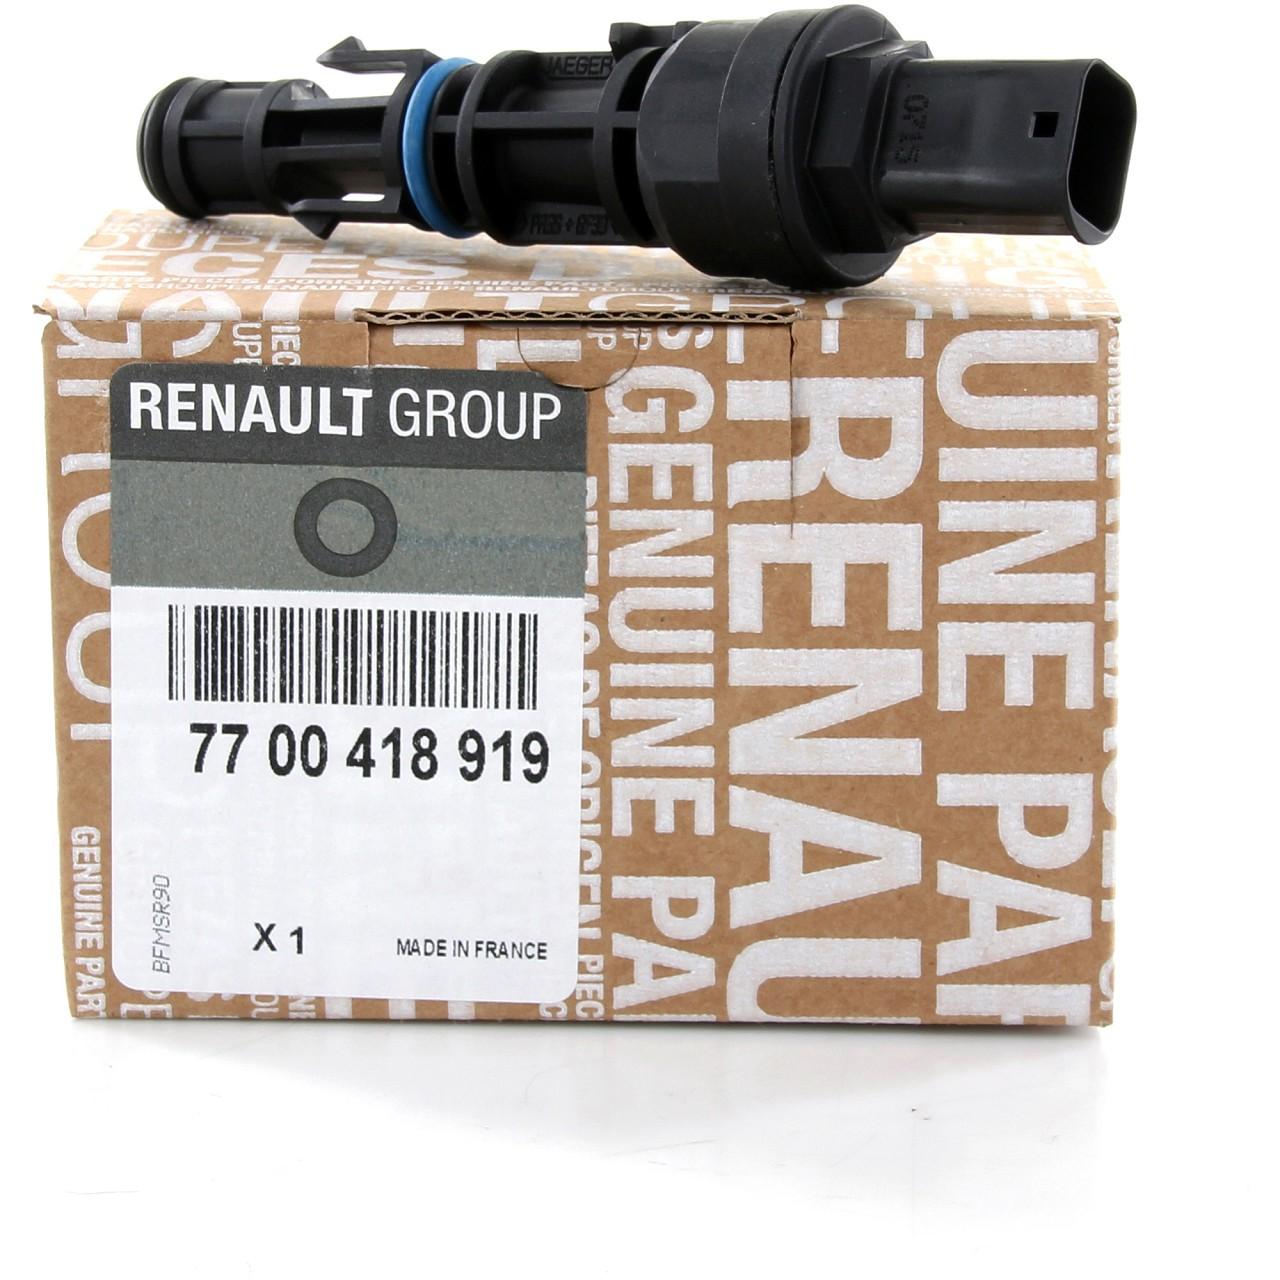 ORIGINAL Renault Tachogeber Tachosensor Geschwindigkeitssensor 7700418919